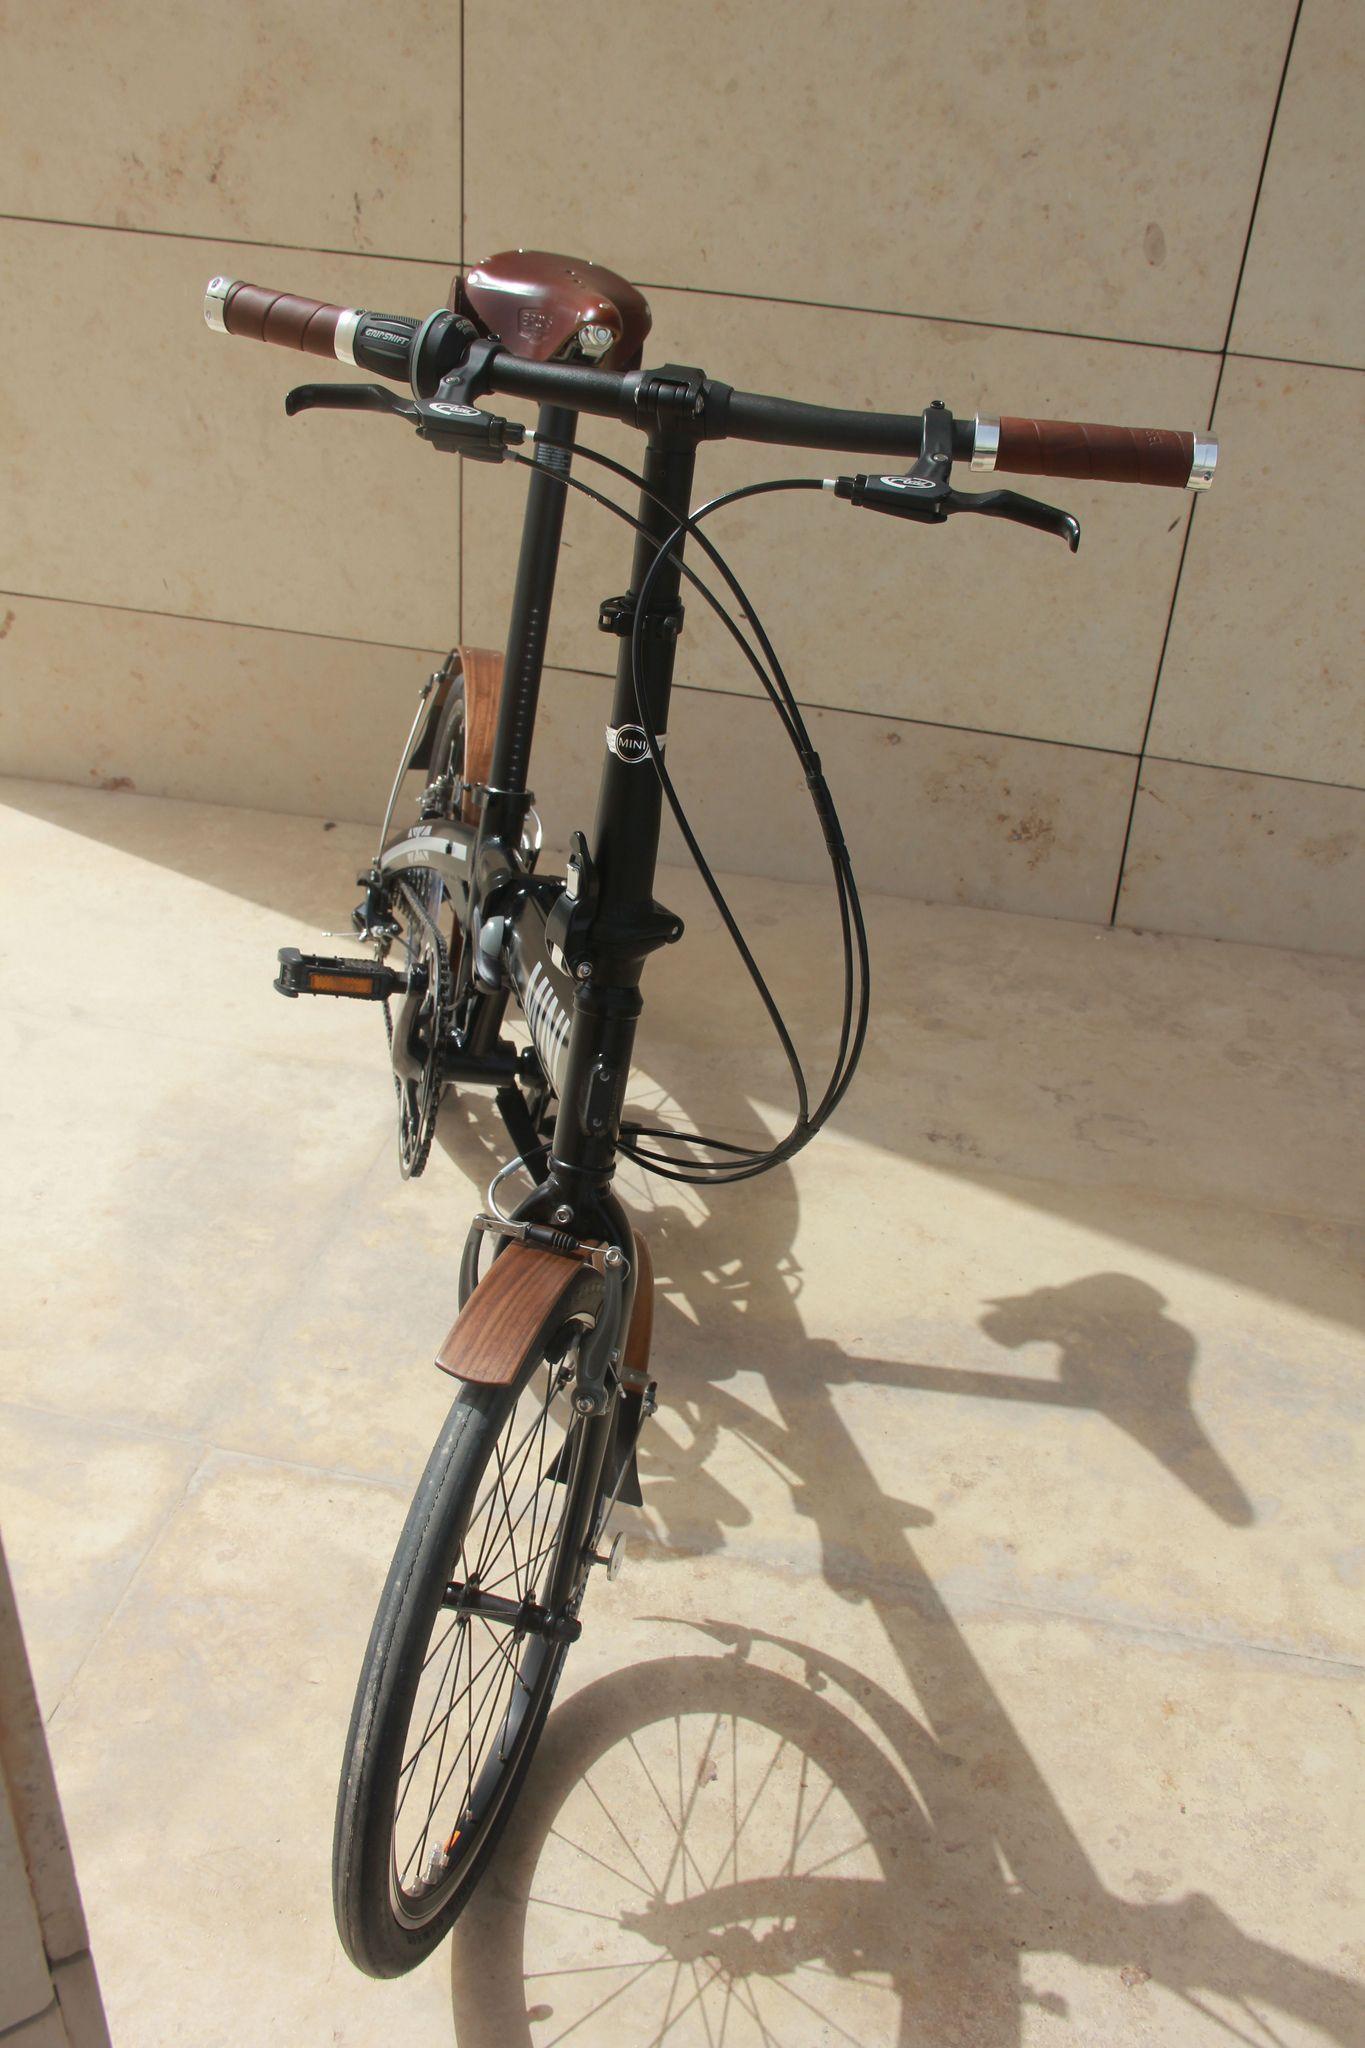 Mini Folding Bike Dubai Folding Bike Urban Bicycle 20 Inch Wheels